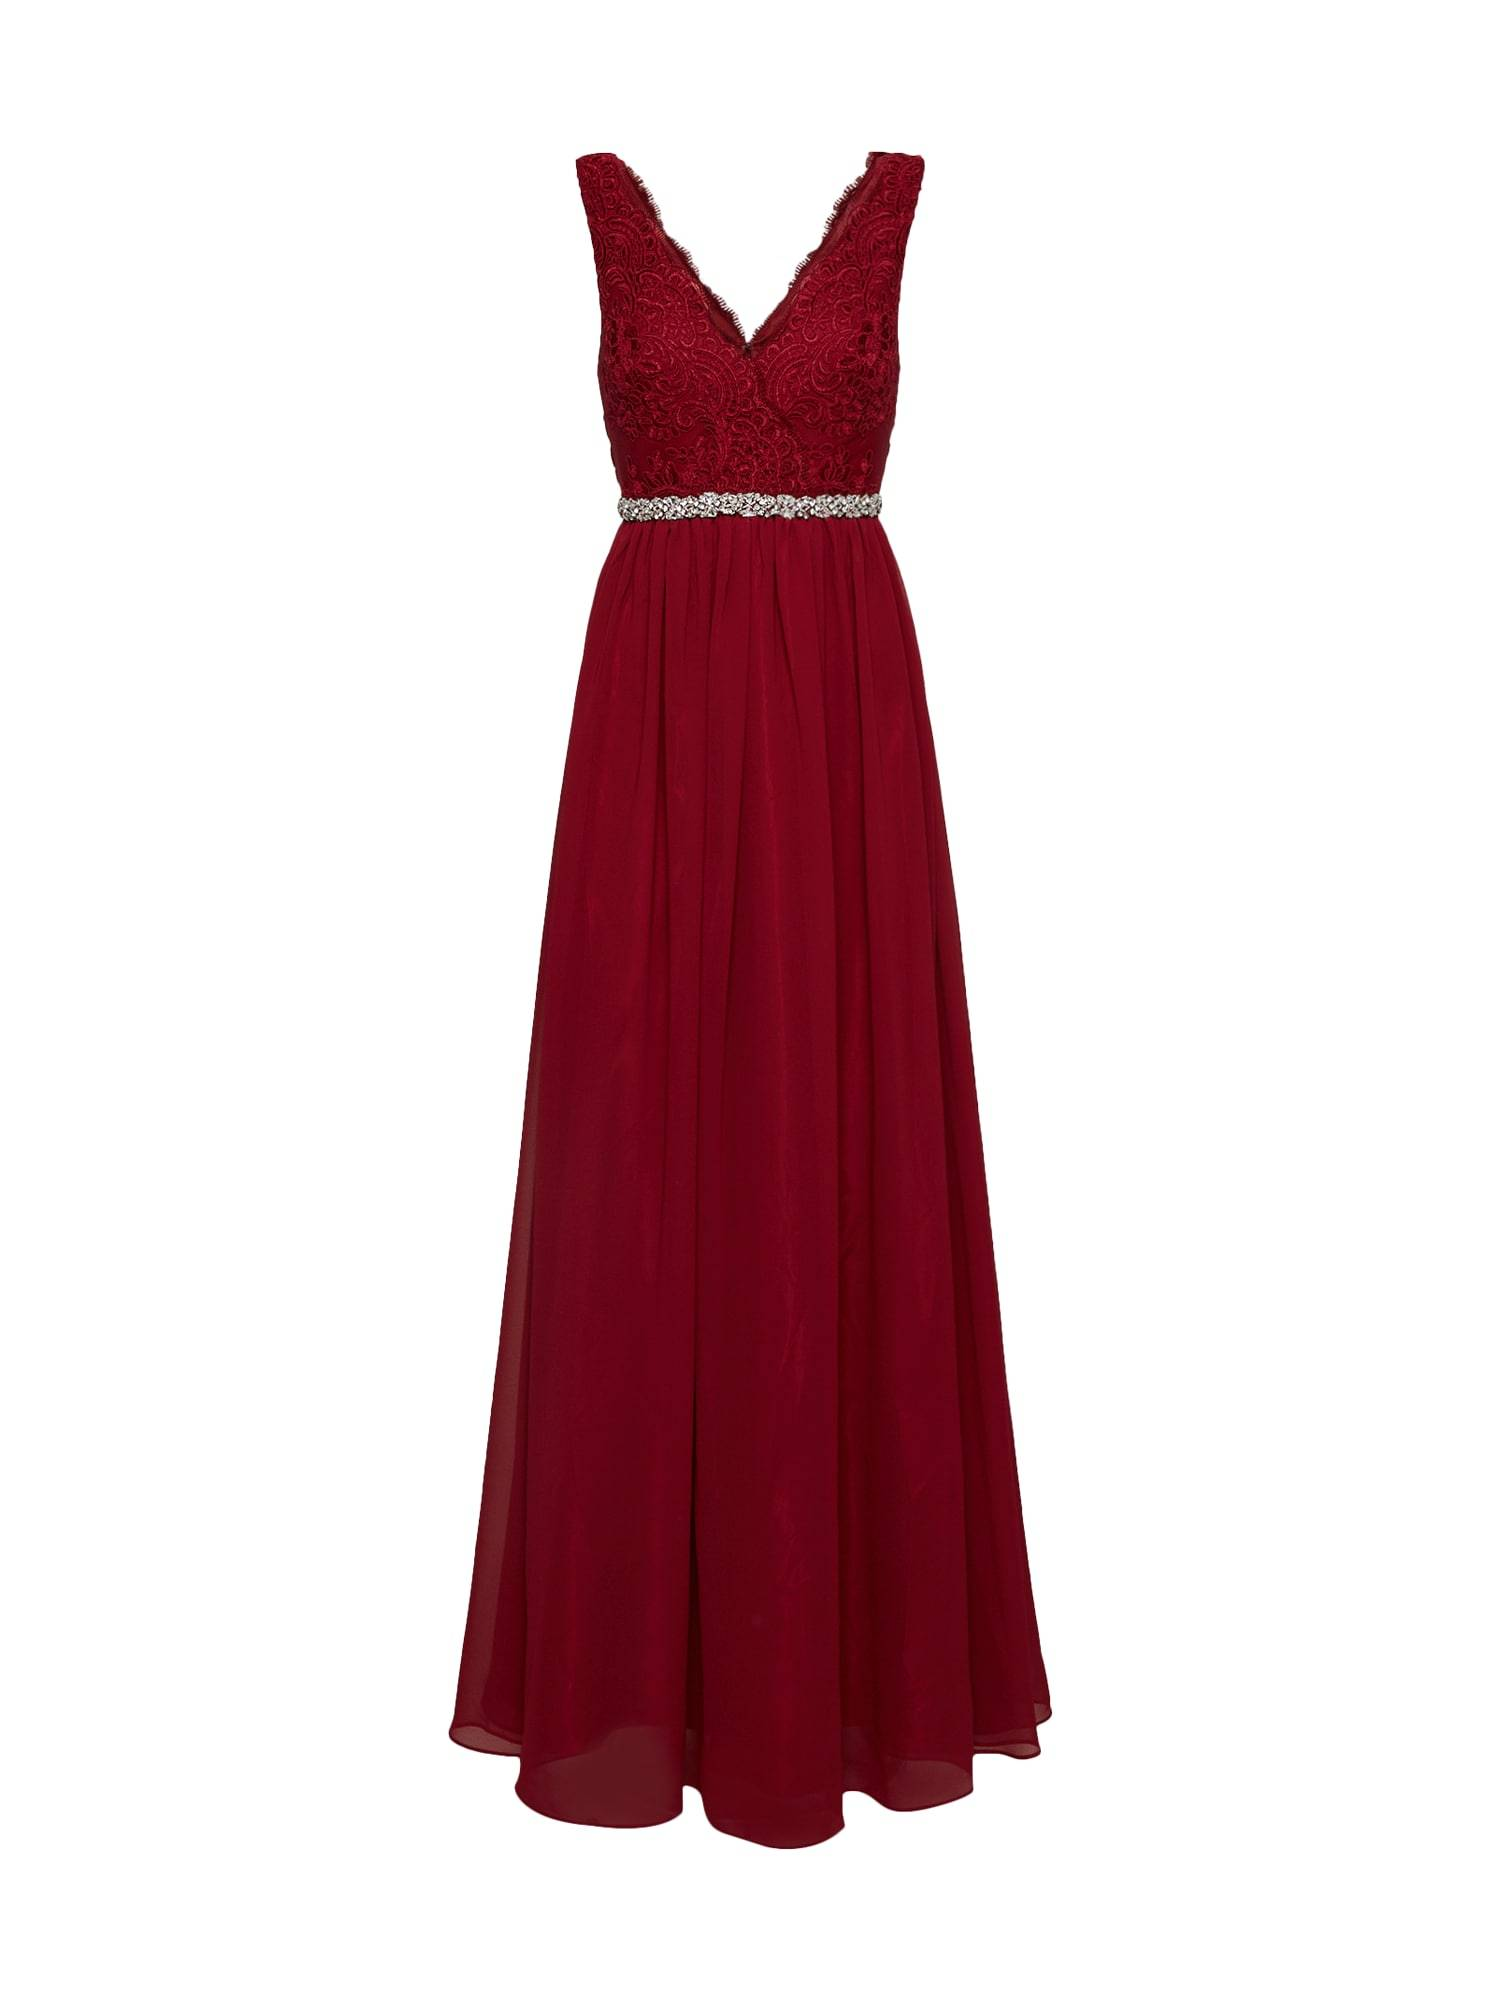 mascara Robe de soirée  - Rouge - Taille: 38 - female